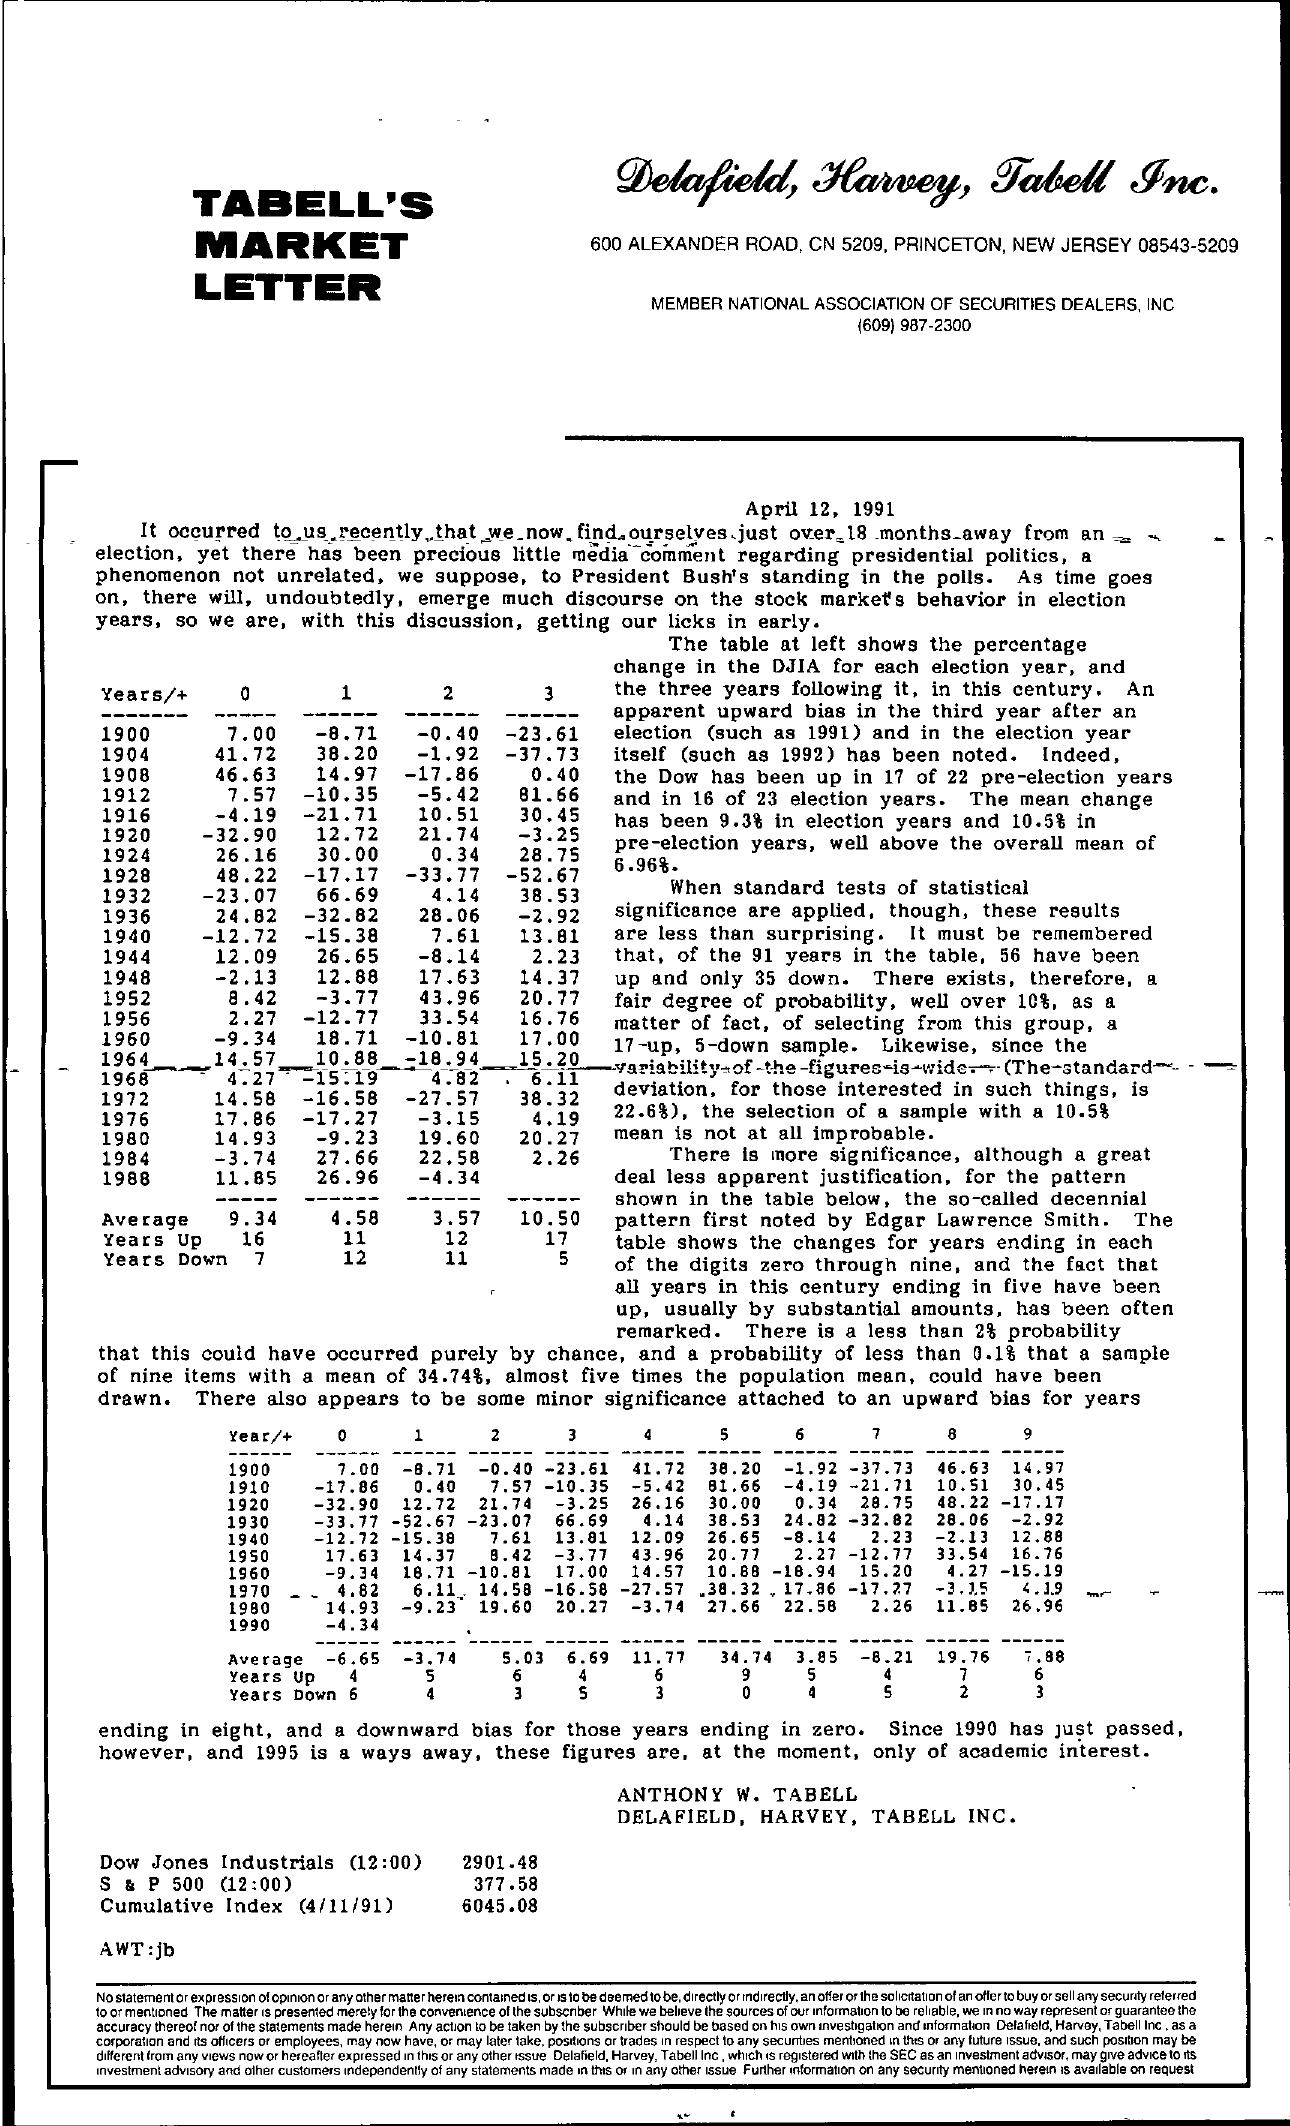 Tabell's Market Letter - April 12, 1991